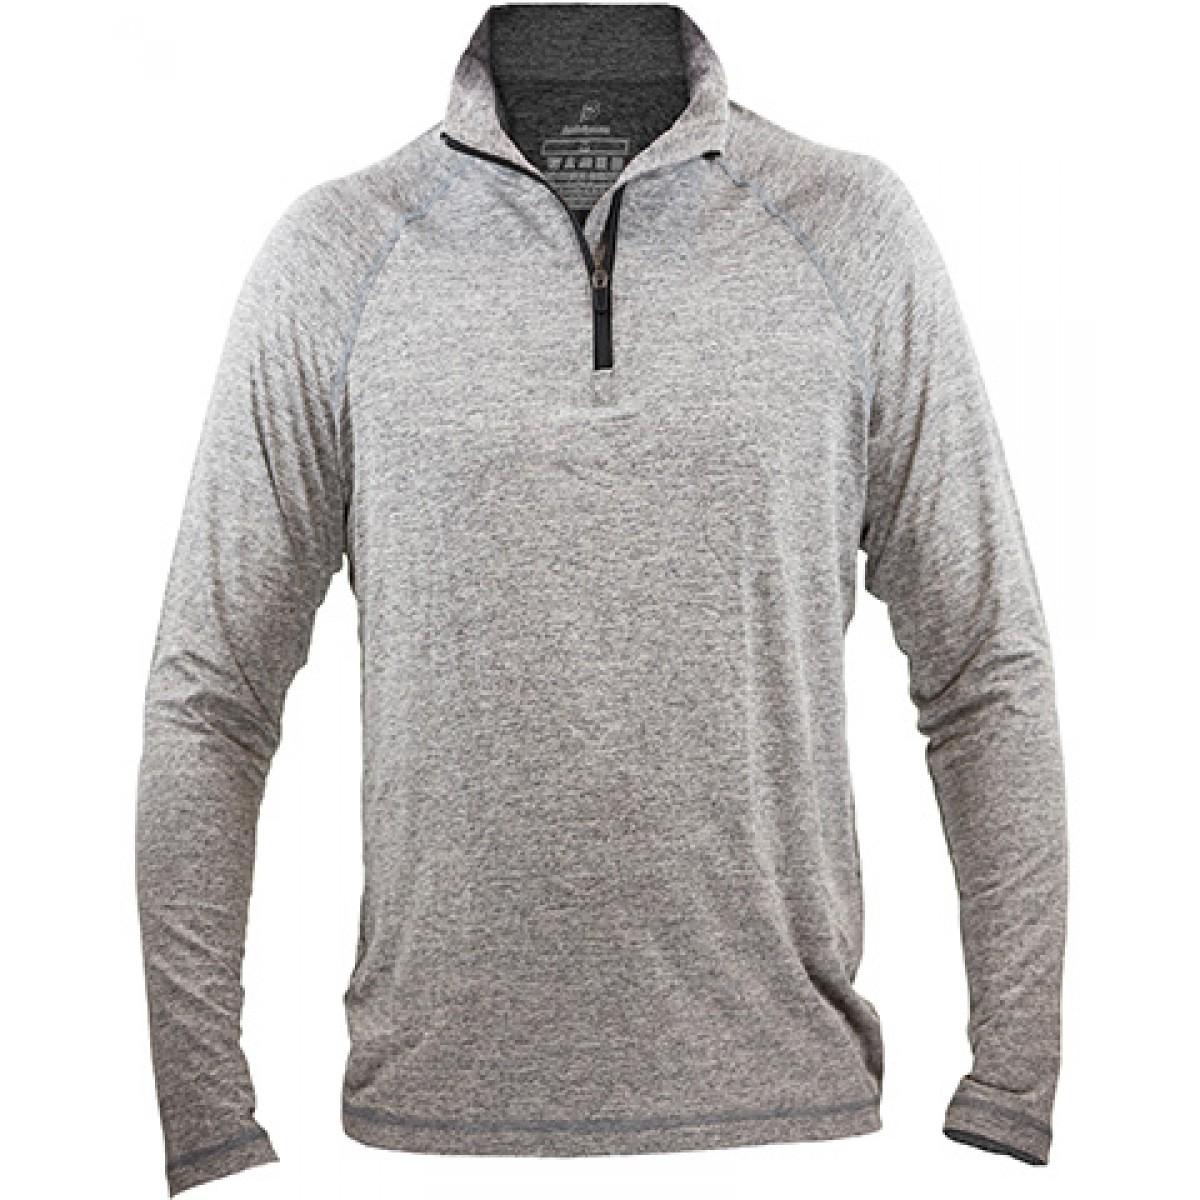 Fine Designs Blend 1/4-Zip Pullover-Gray -M